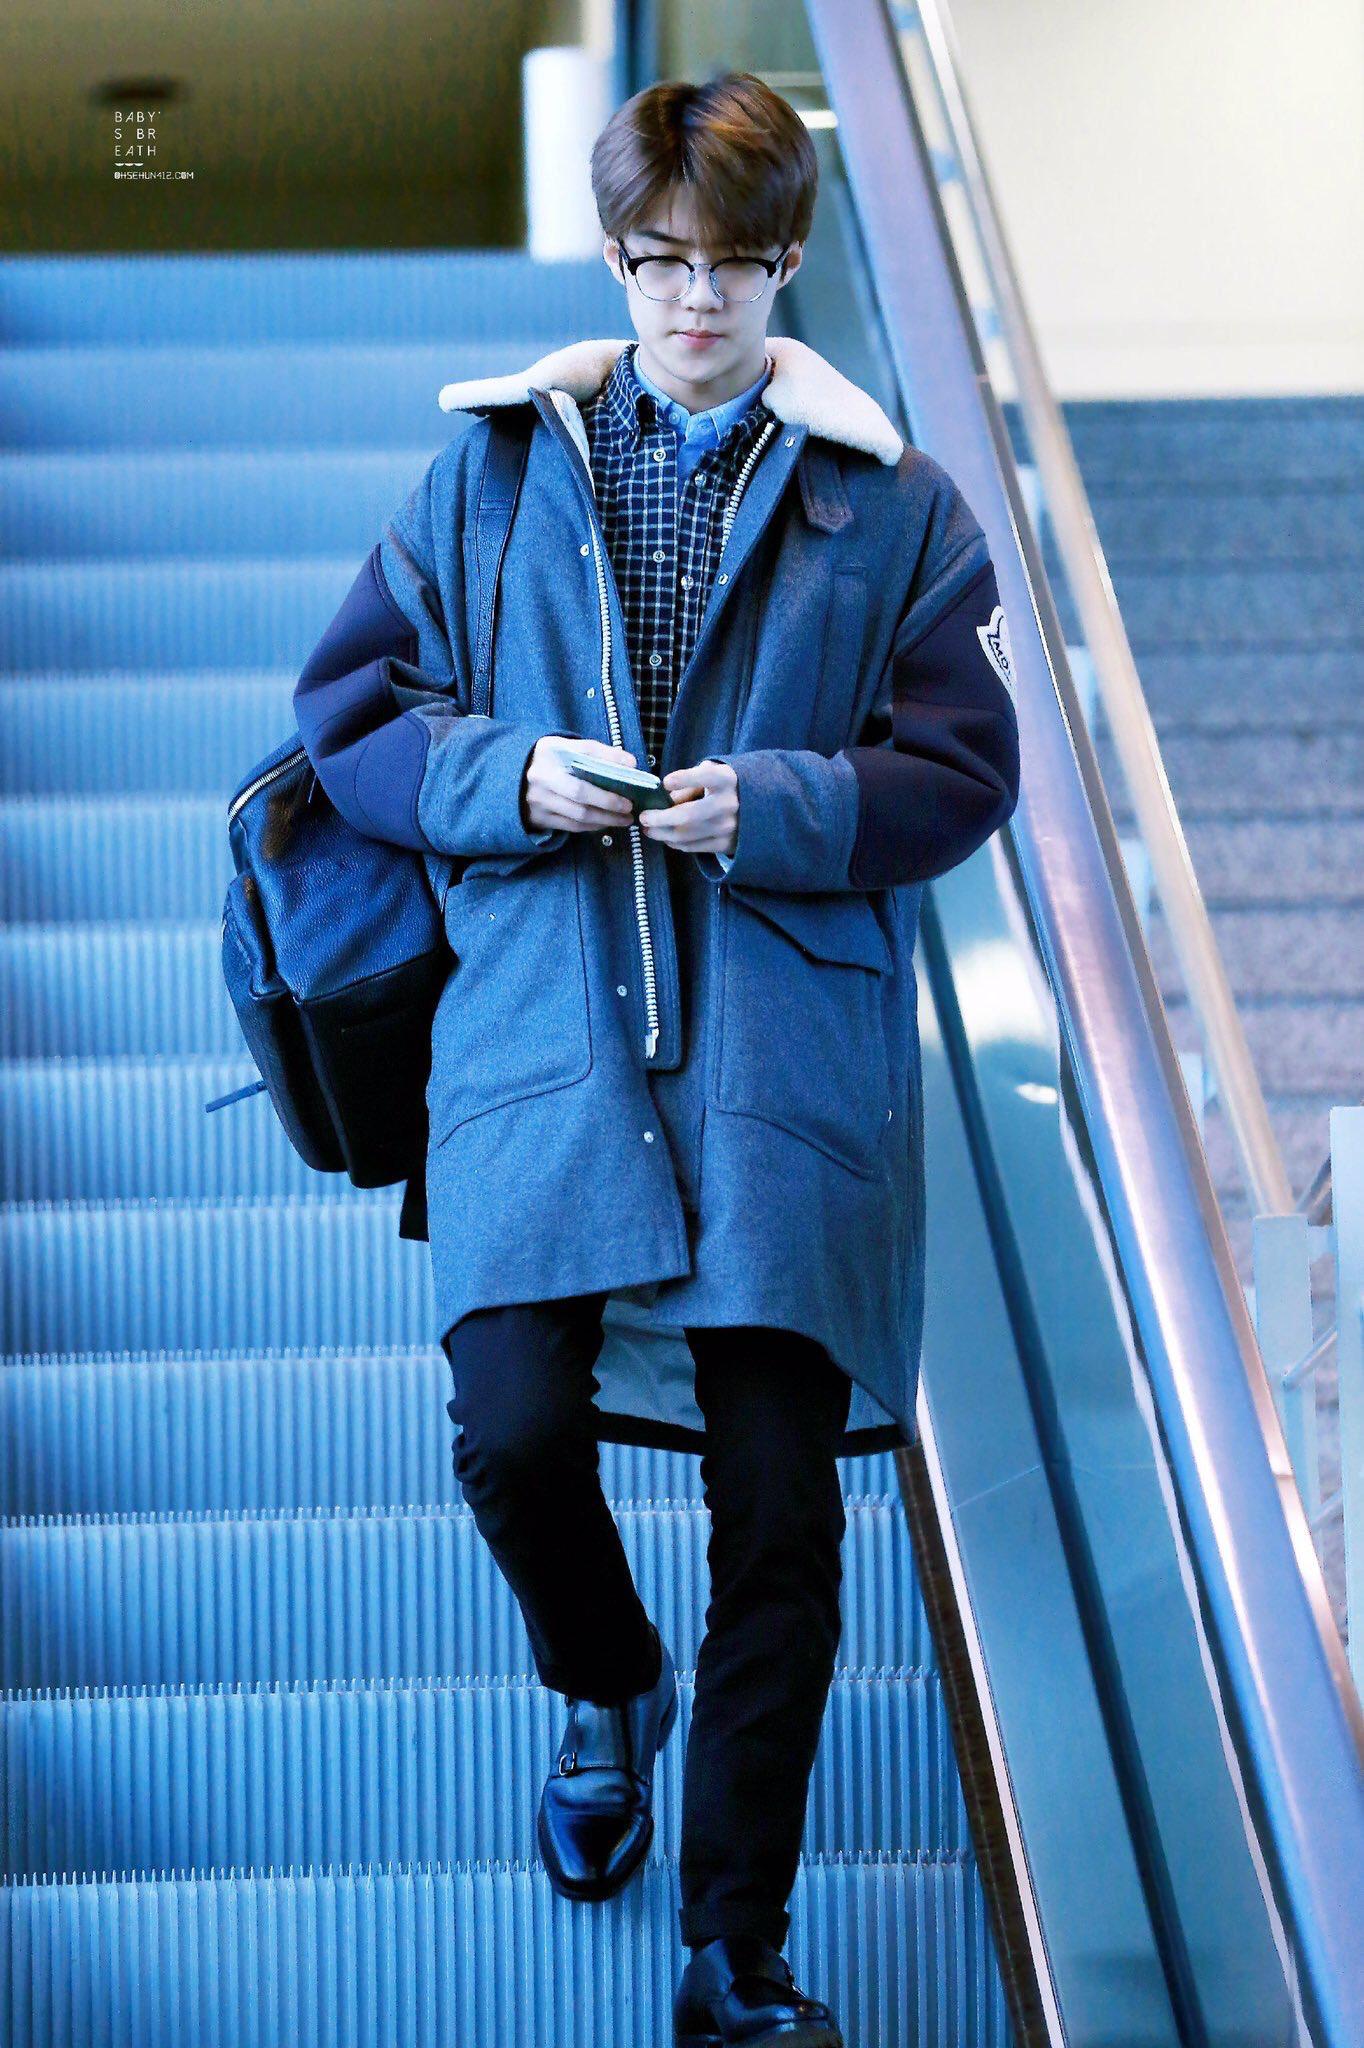 Pin by 아이싸 on EXO 엑수 짱 Exo airport fashion sehun, Exo